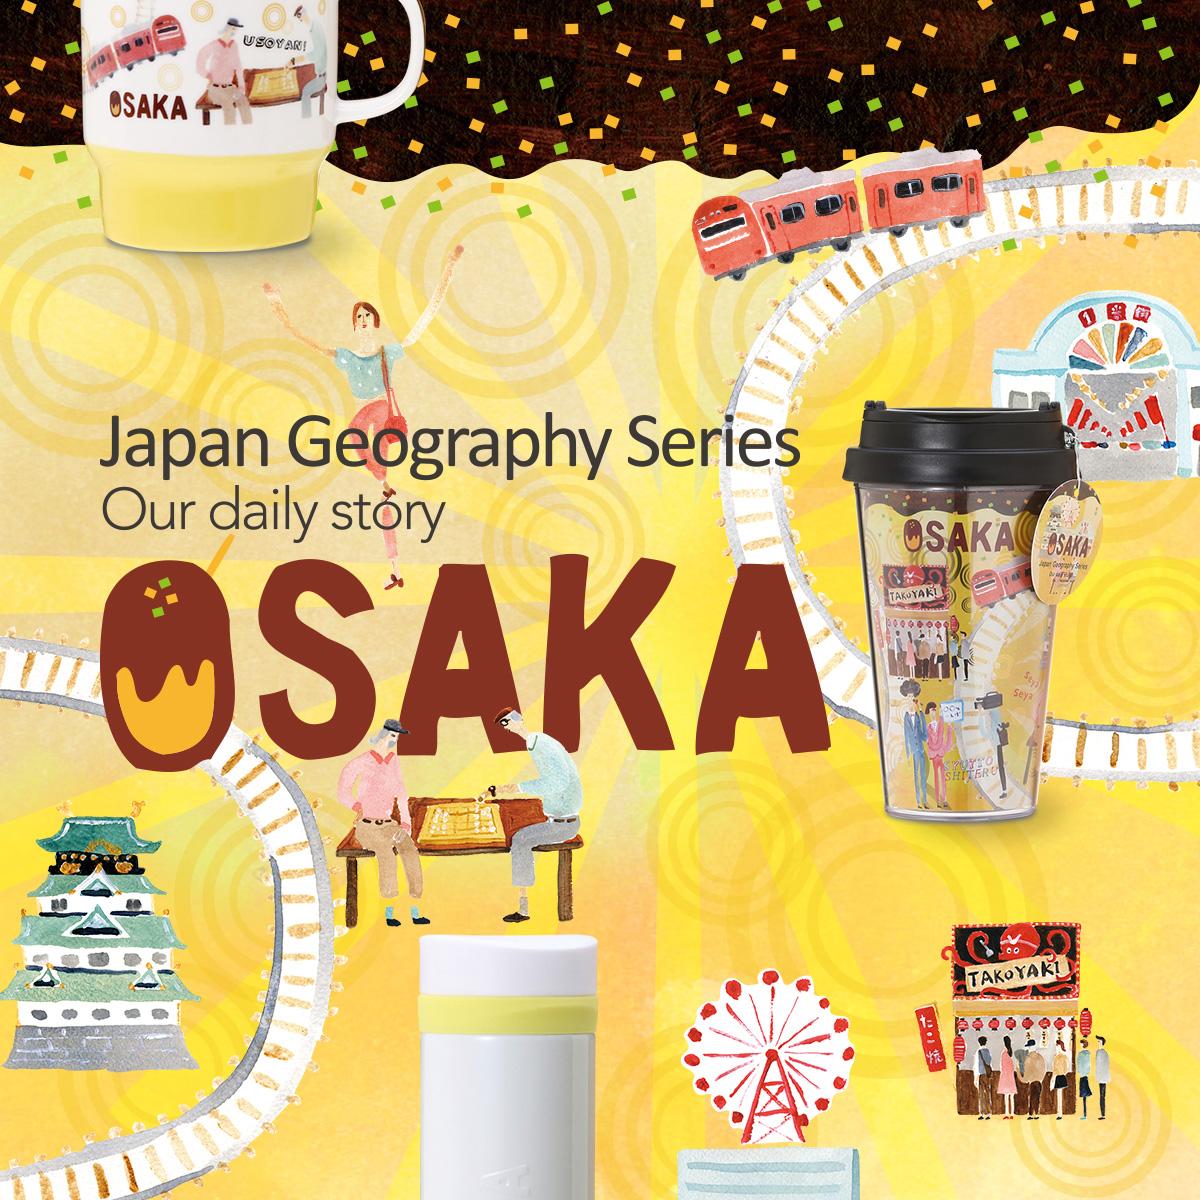 Japan Geography Series 大阪